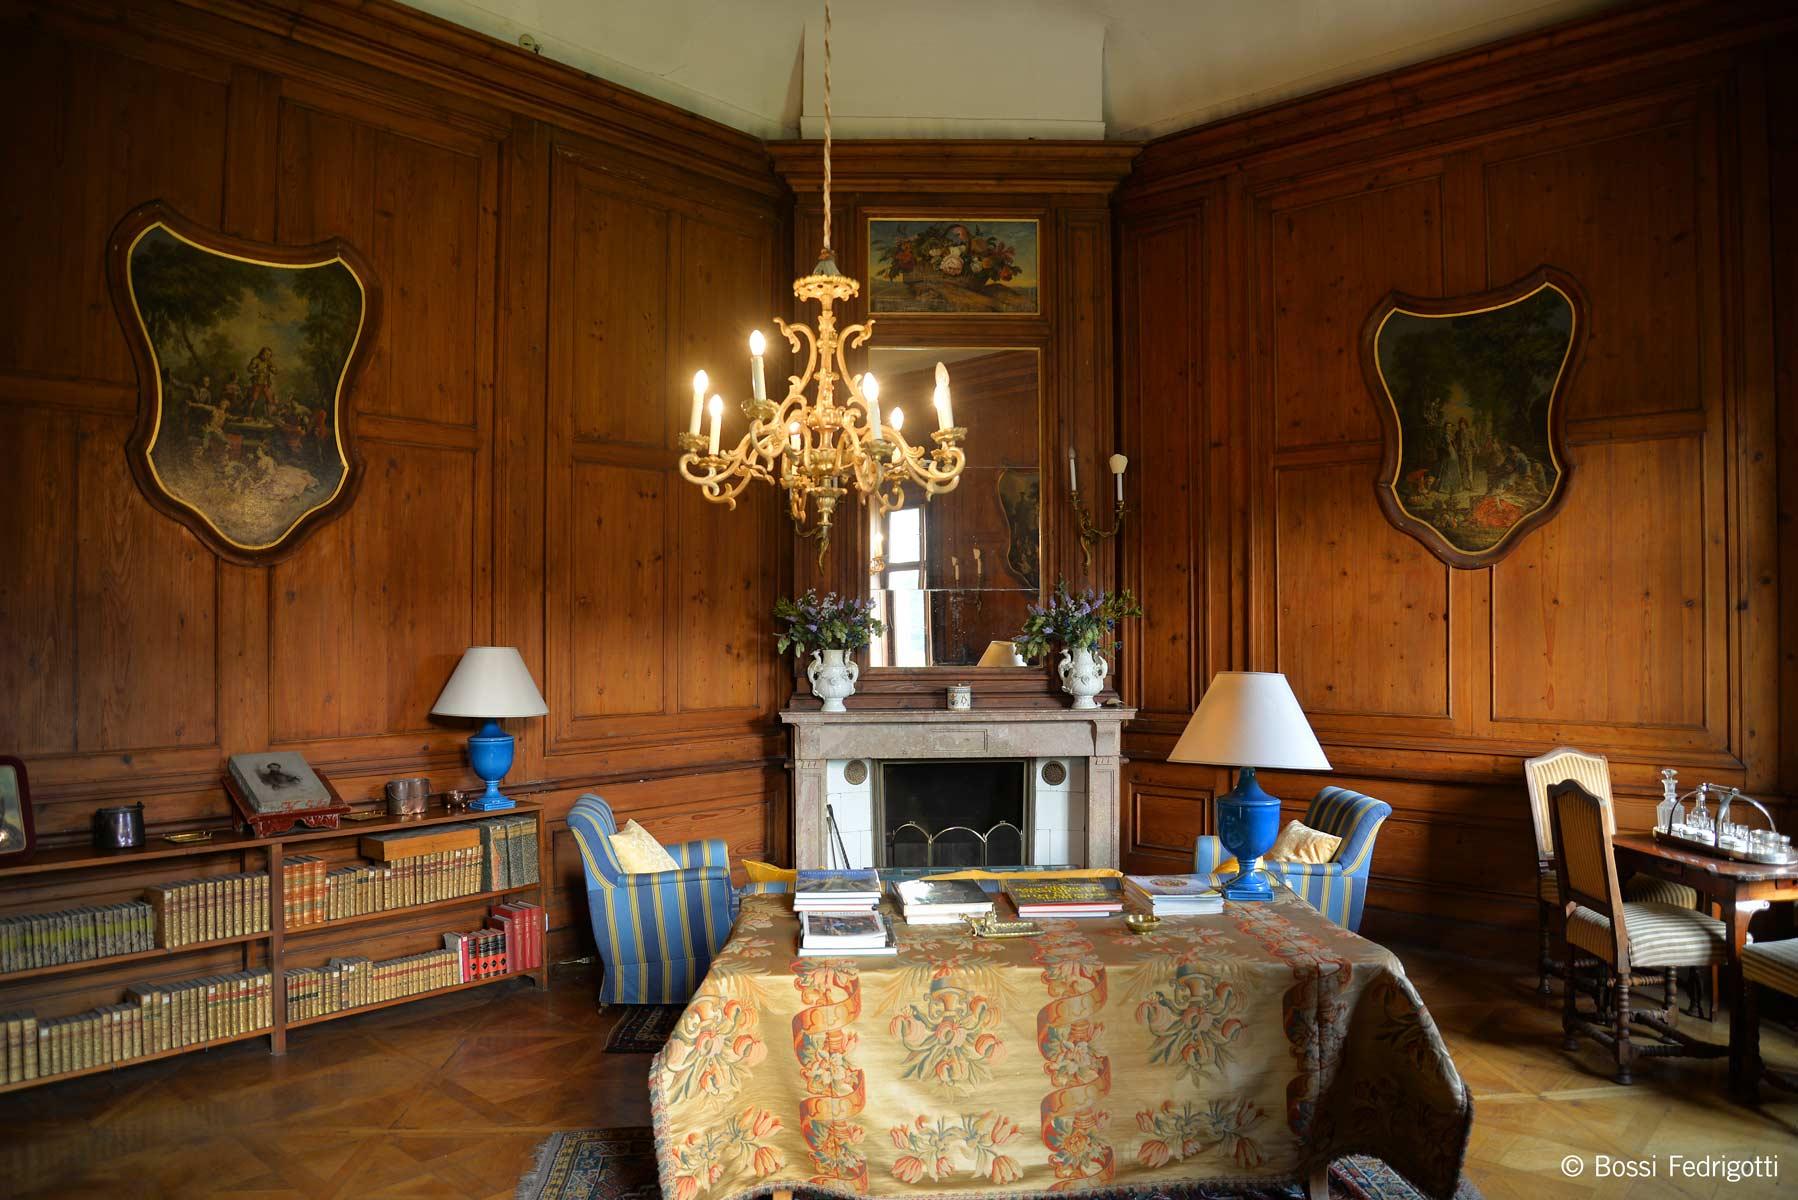 Schloss-Weinern_151_Bossi-Fedrigotti.jpg